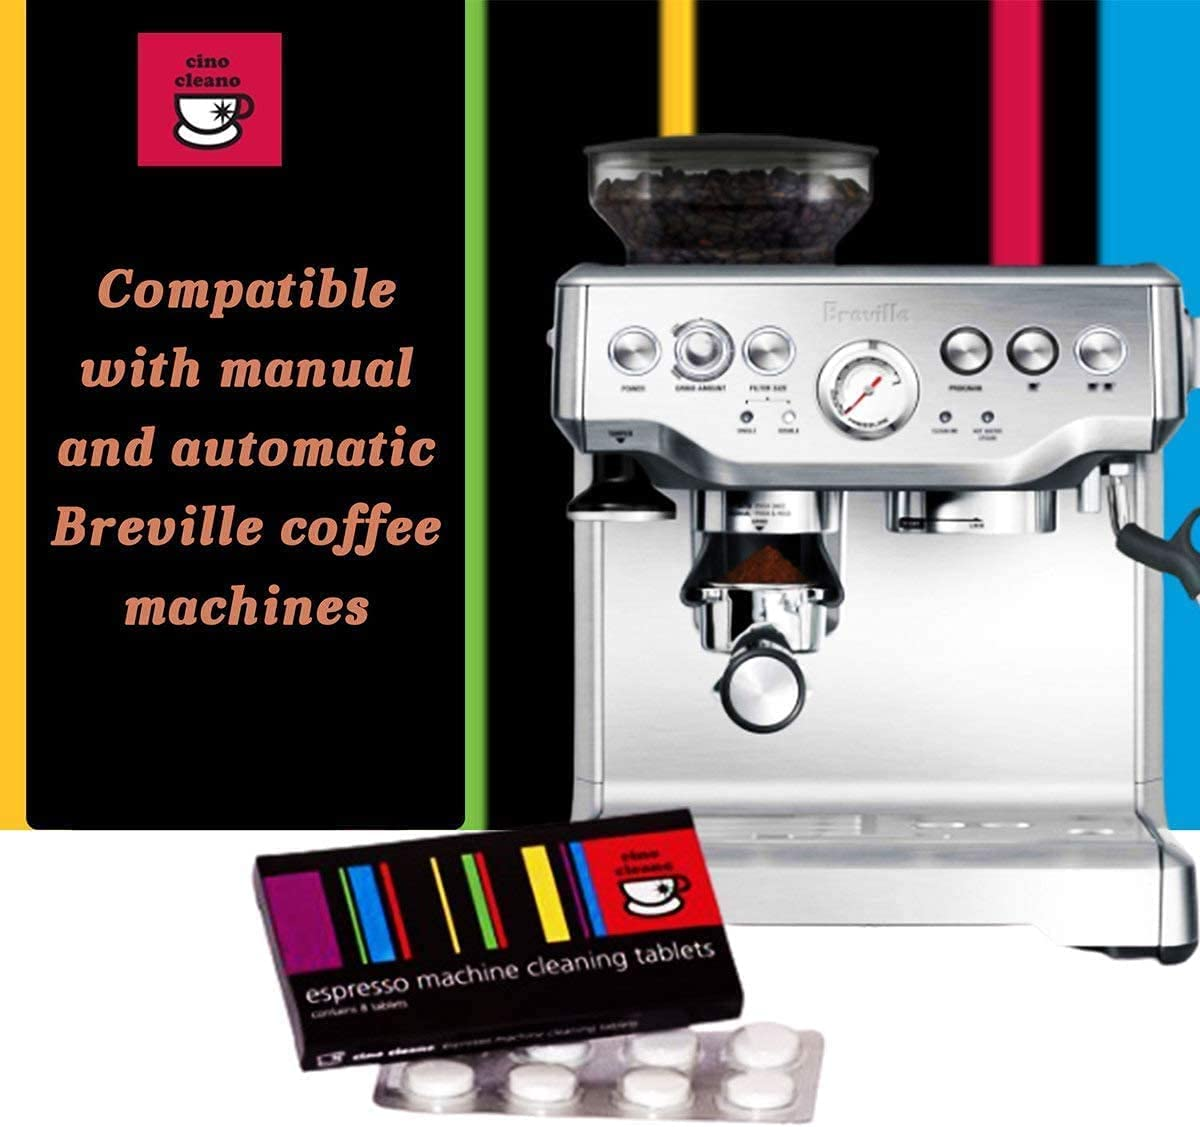 Home & Kitchen Coffee Maker Parts & Accessories ghdonat.com Cino ...